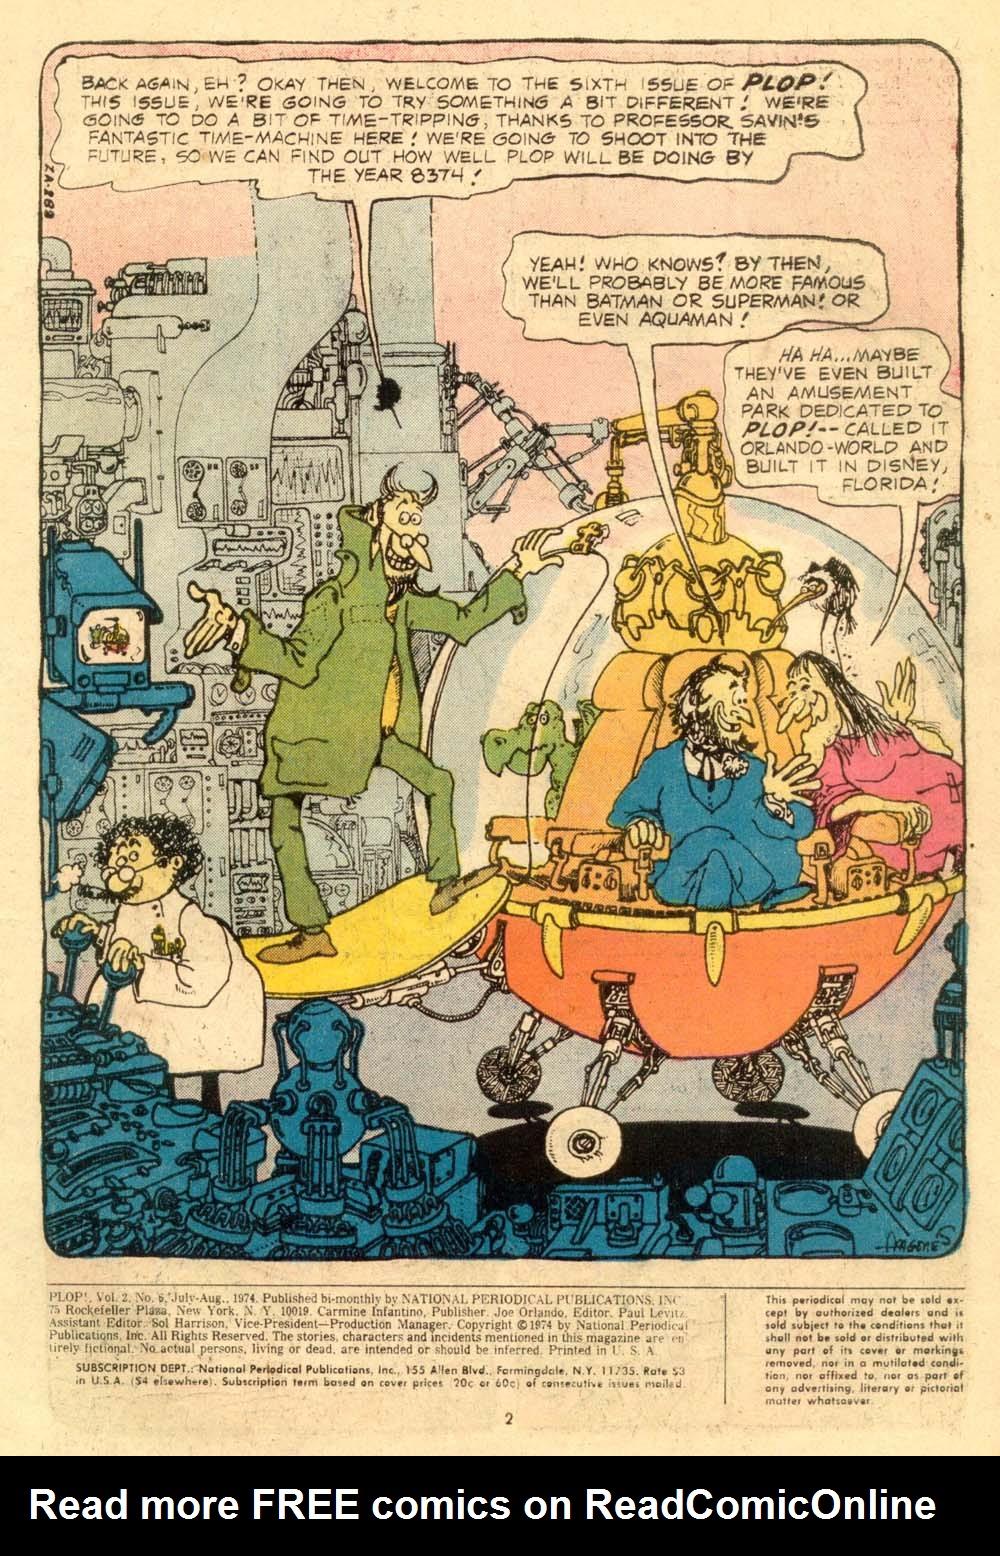 Read online Plop! comic -  Issue #6 - 3